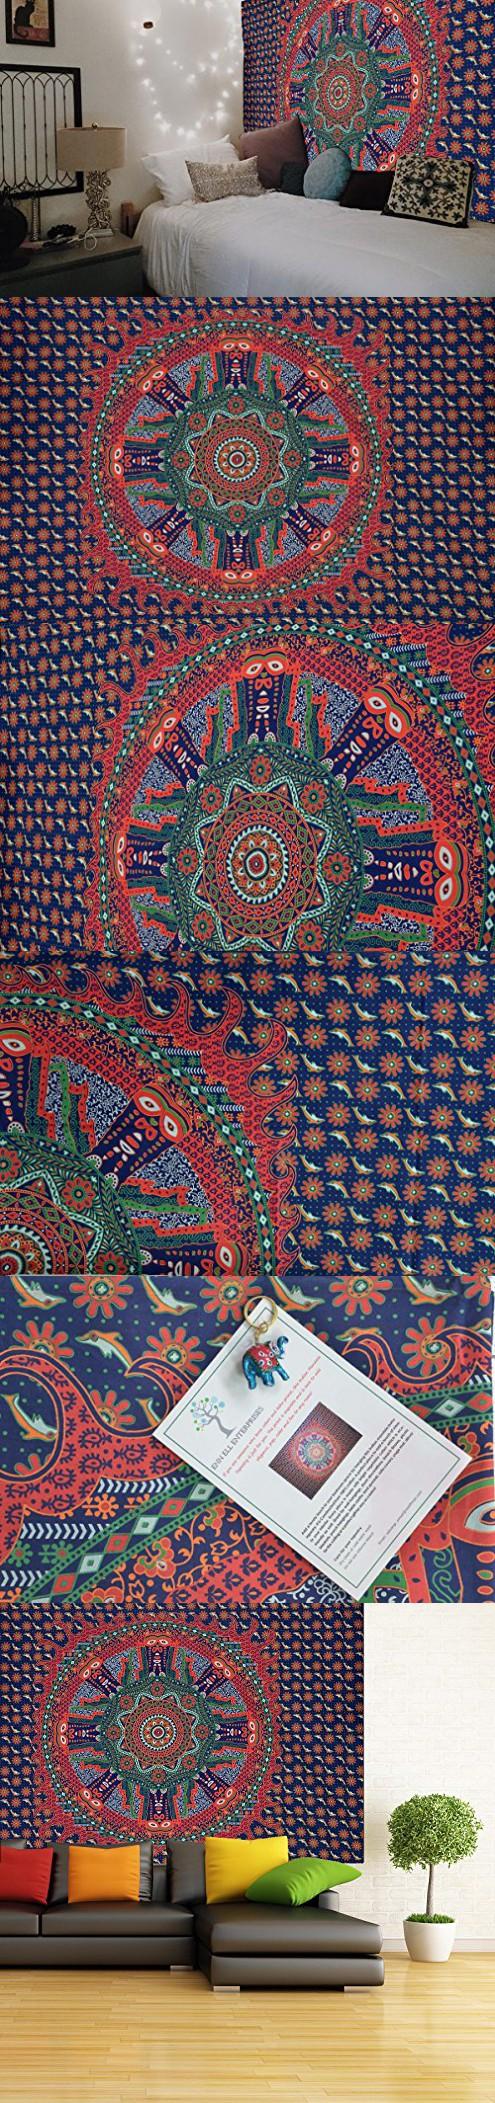 ENN ELL ENTERPRISES Hippie Mandala Bohemian Tiki Man Indian Bedspread Mandala Relaxation Tapestry, 84X54 Inches, Blue